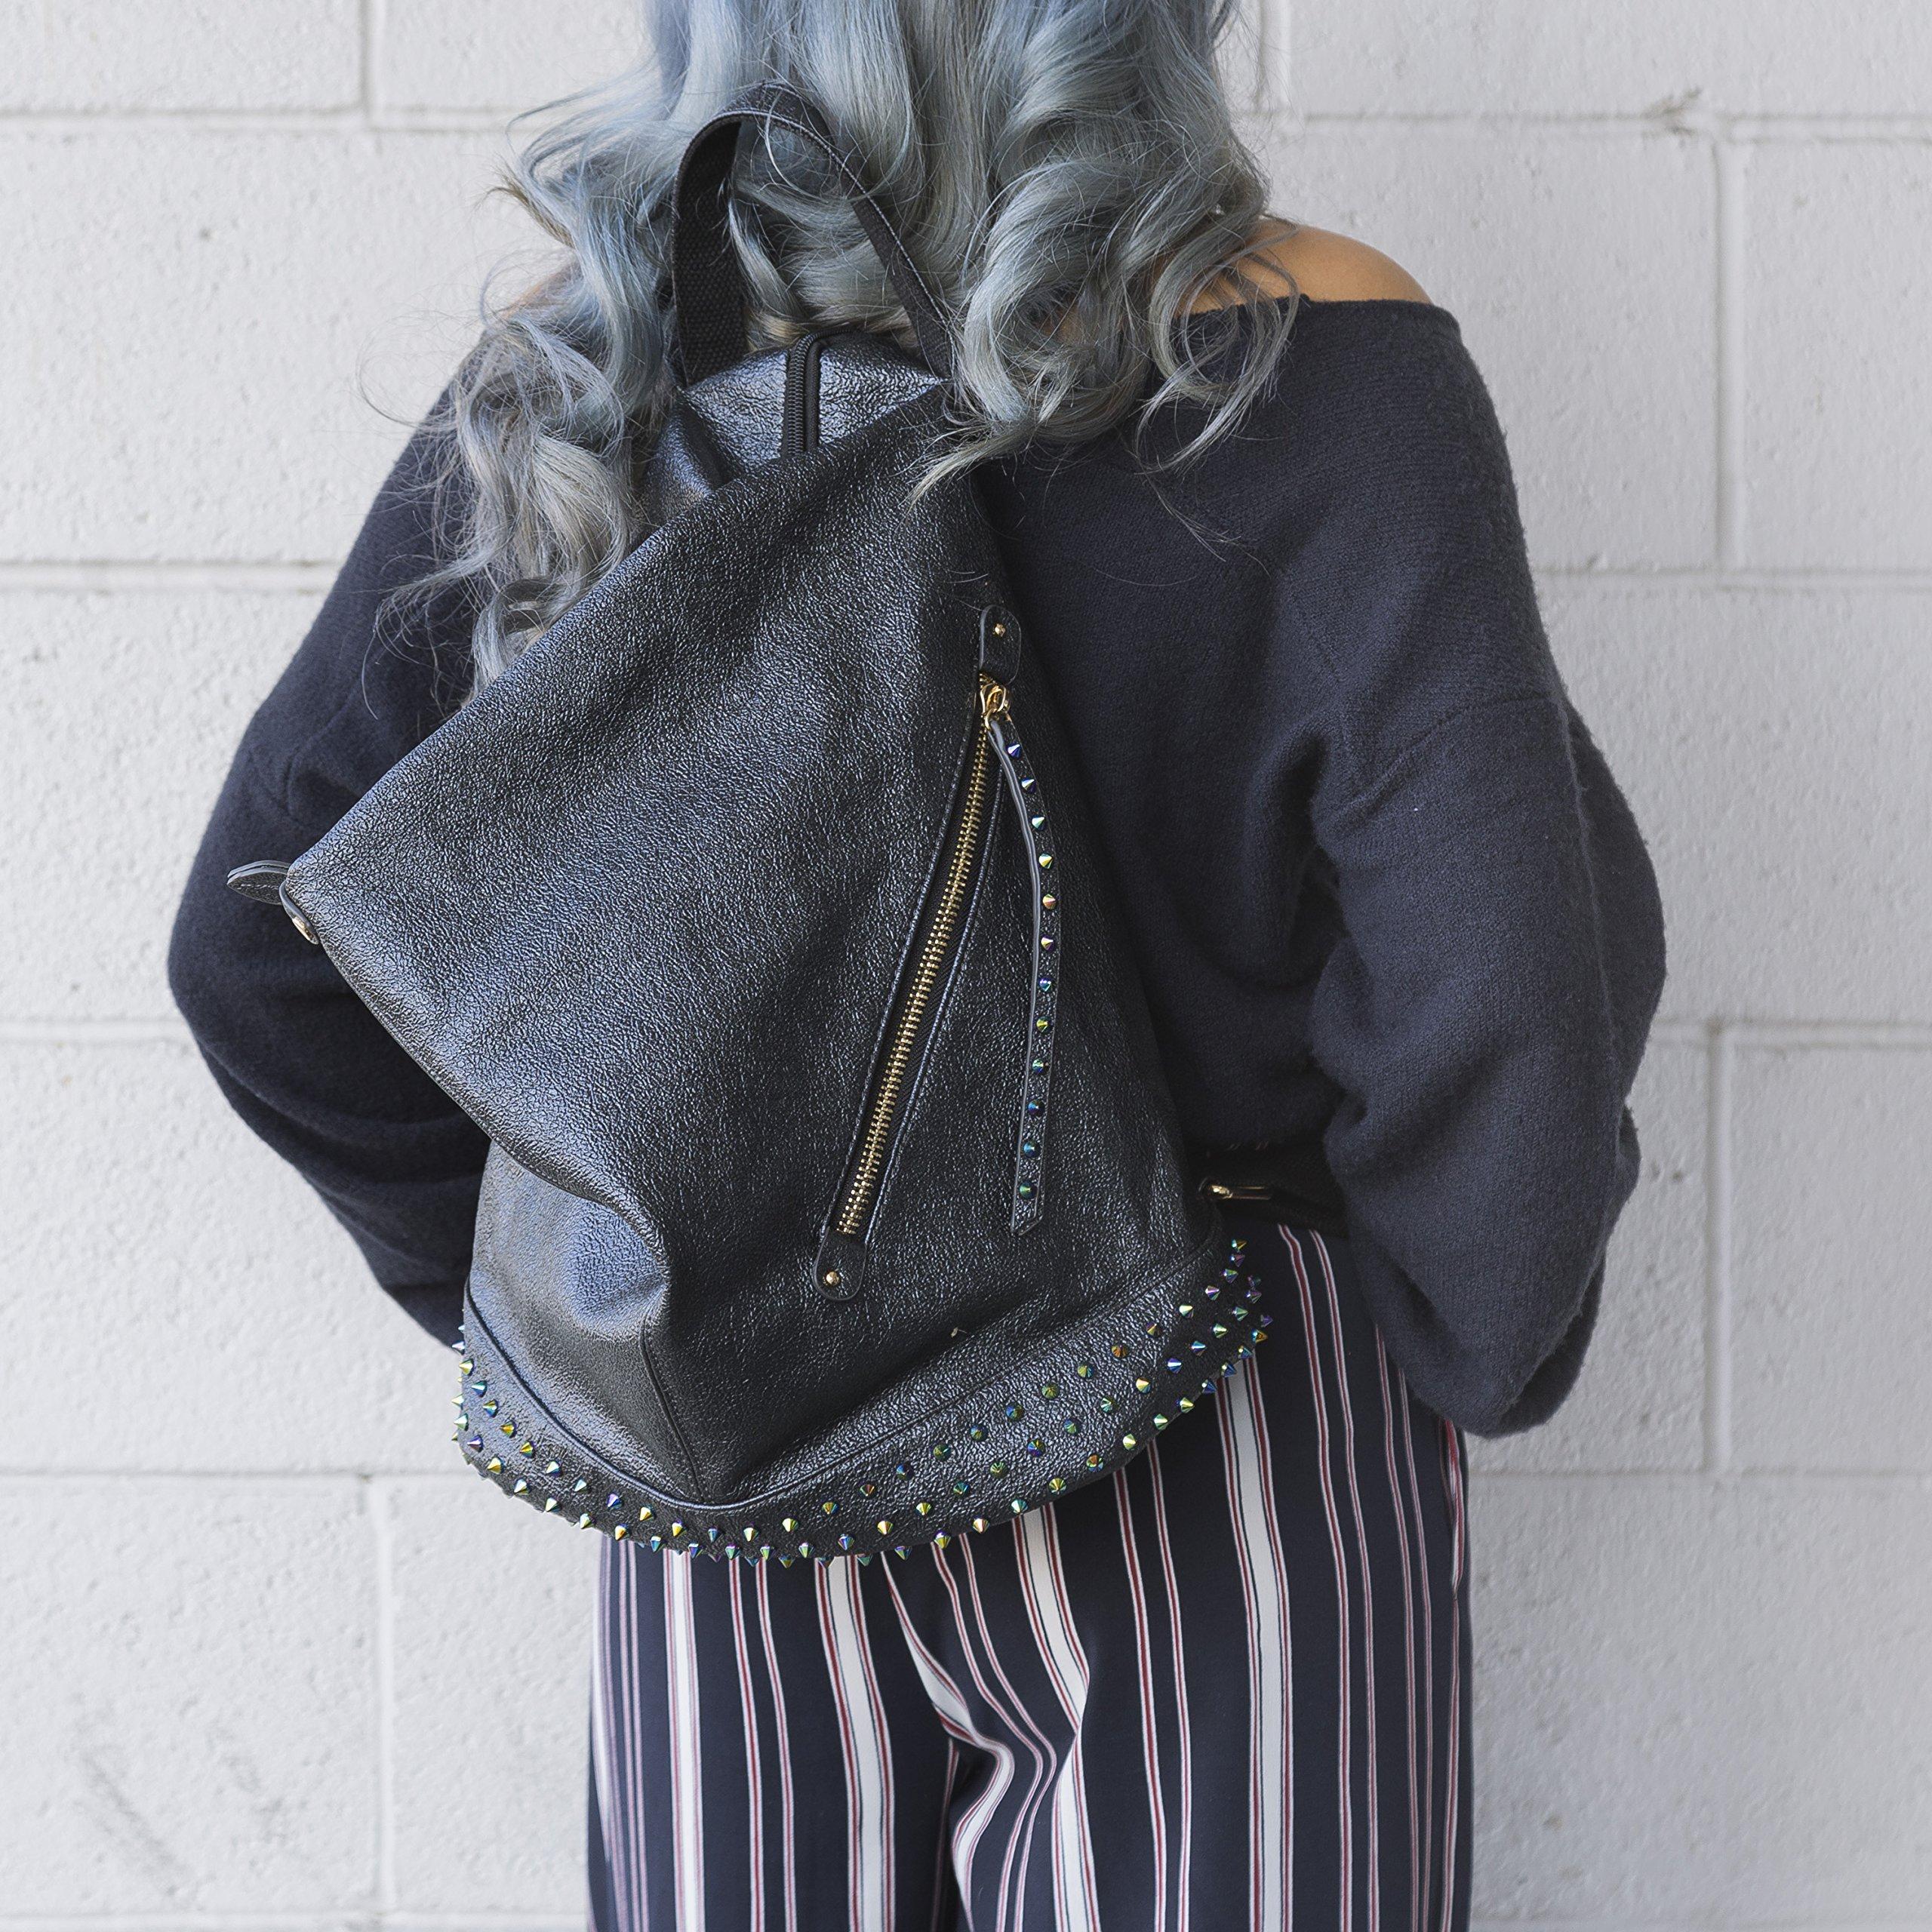 Handbag Republic Fashion Backpack Vegan Leather Travel Bag Easy Carry For Women by Handbag Republic (Image #6)